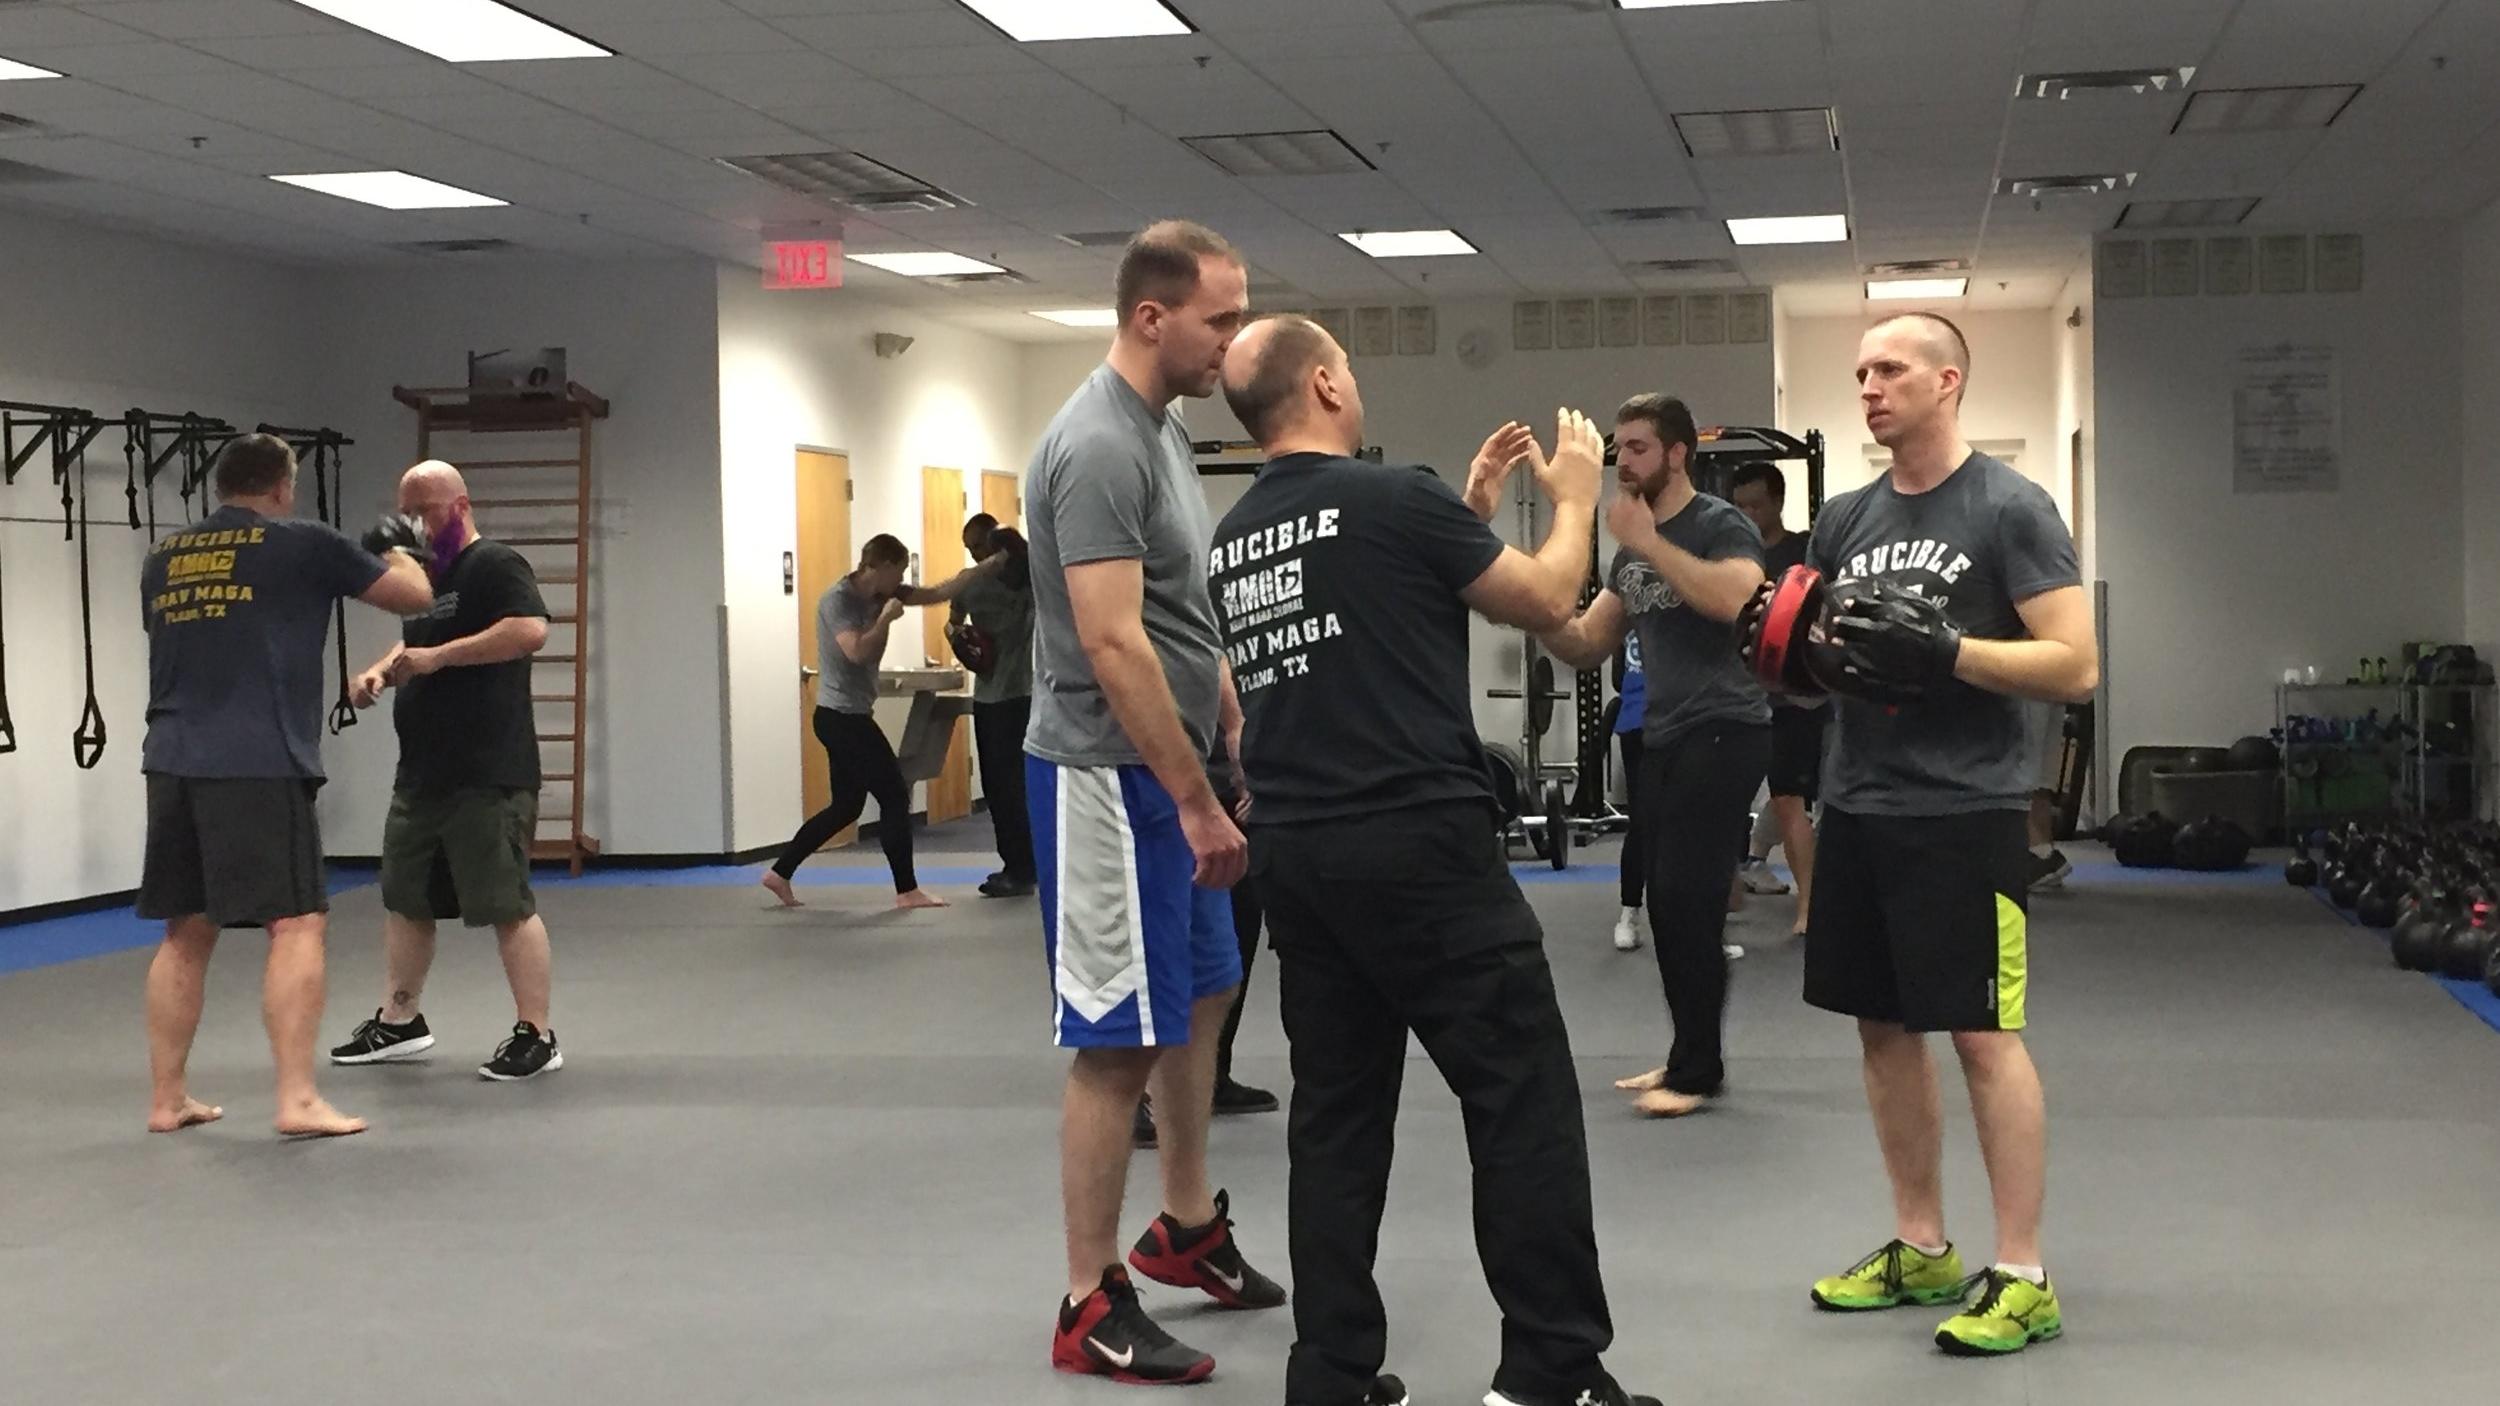 Mike Kawa teaching striking technique.